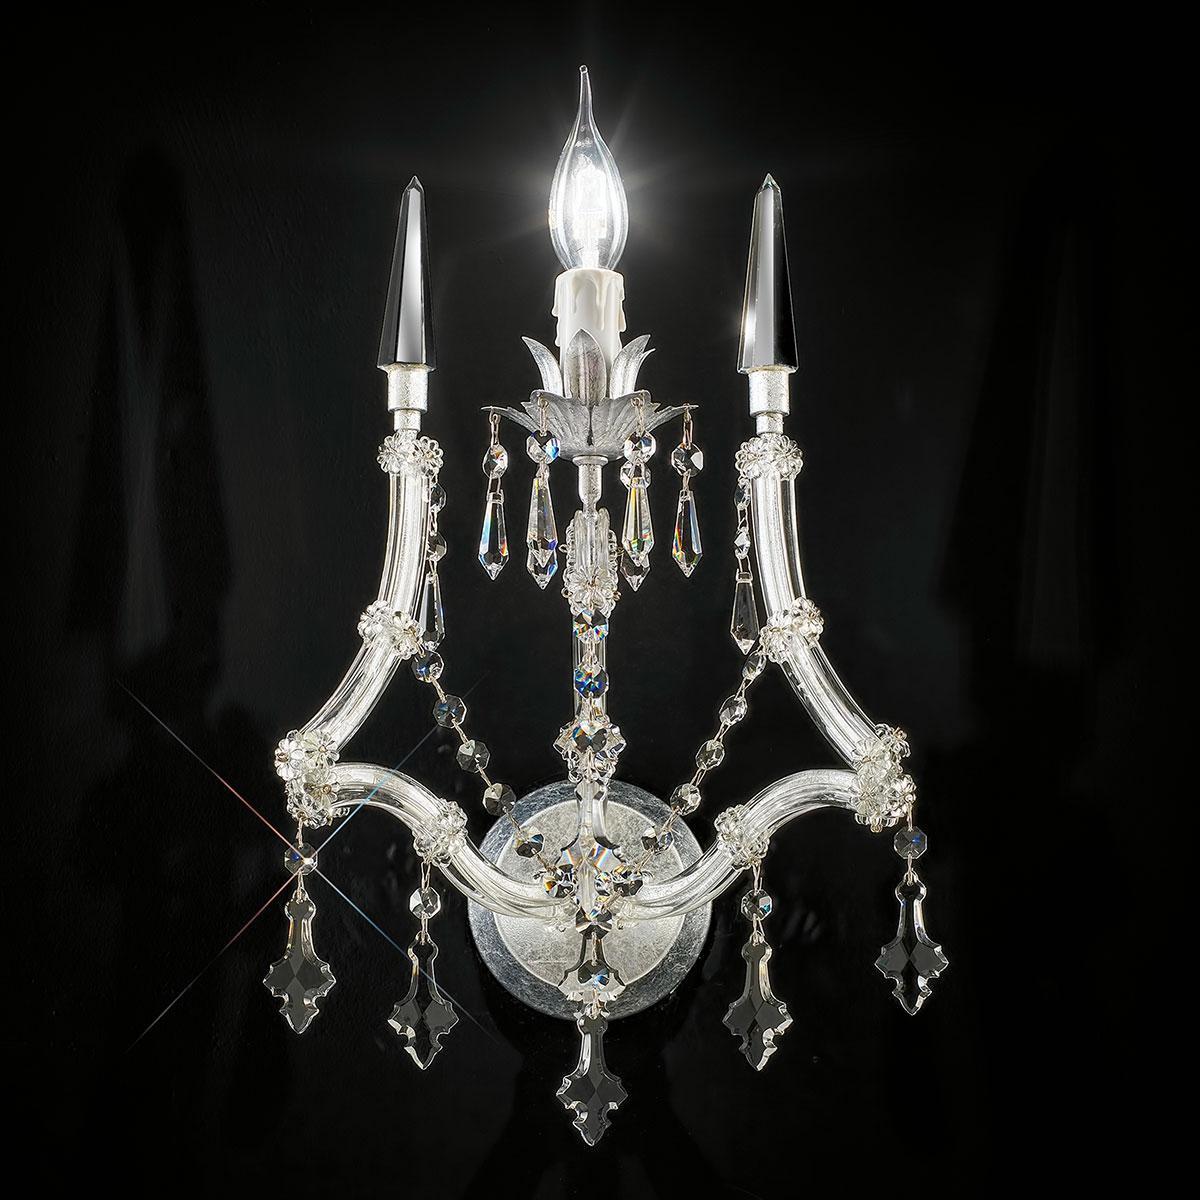 """Cattaneo"" venezianischer kristall wandleuchte - 1 flammig - transparent mit kristal Asfour"